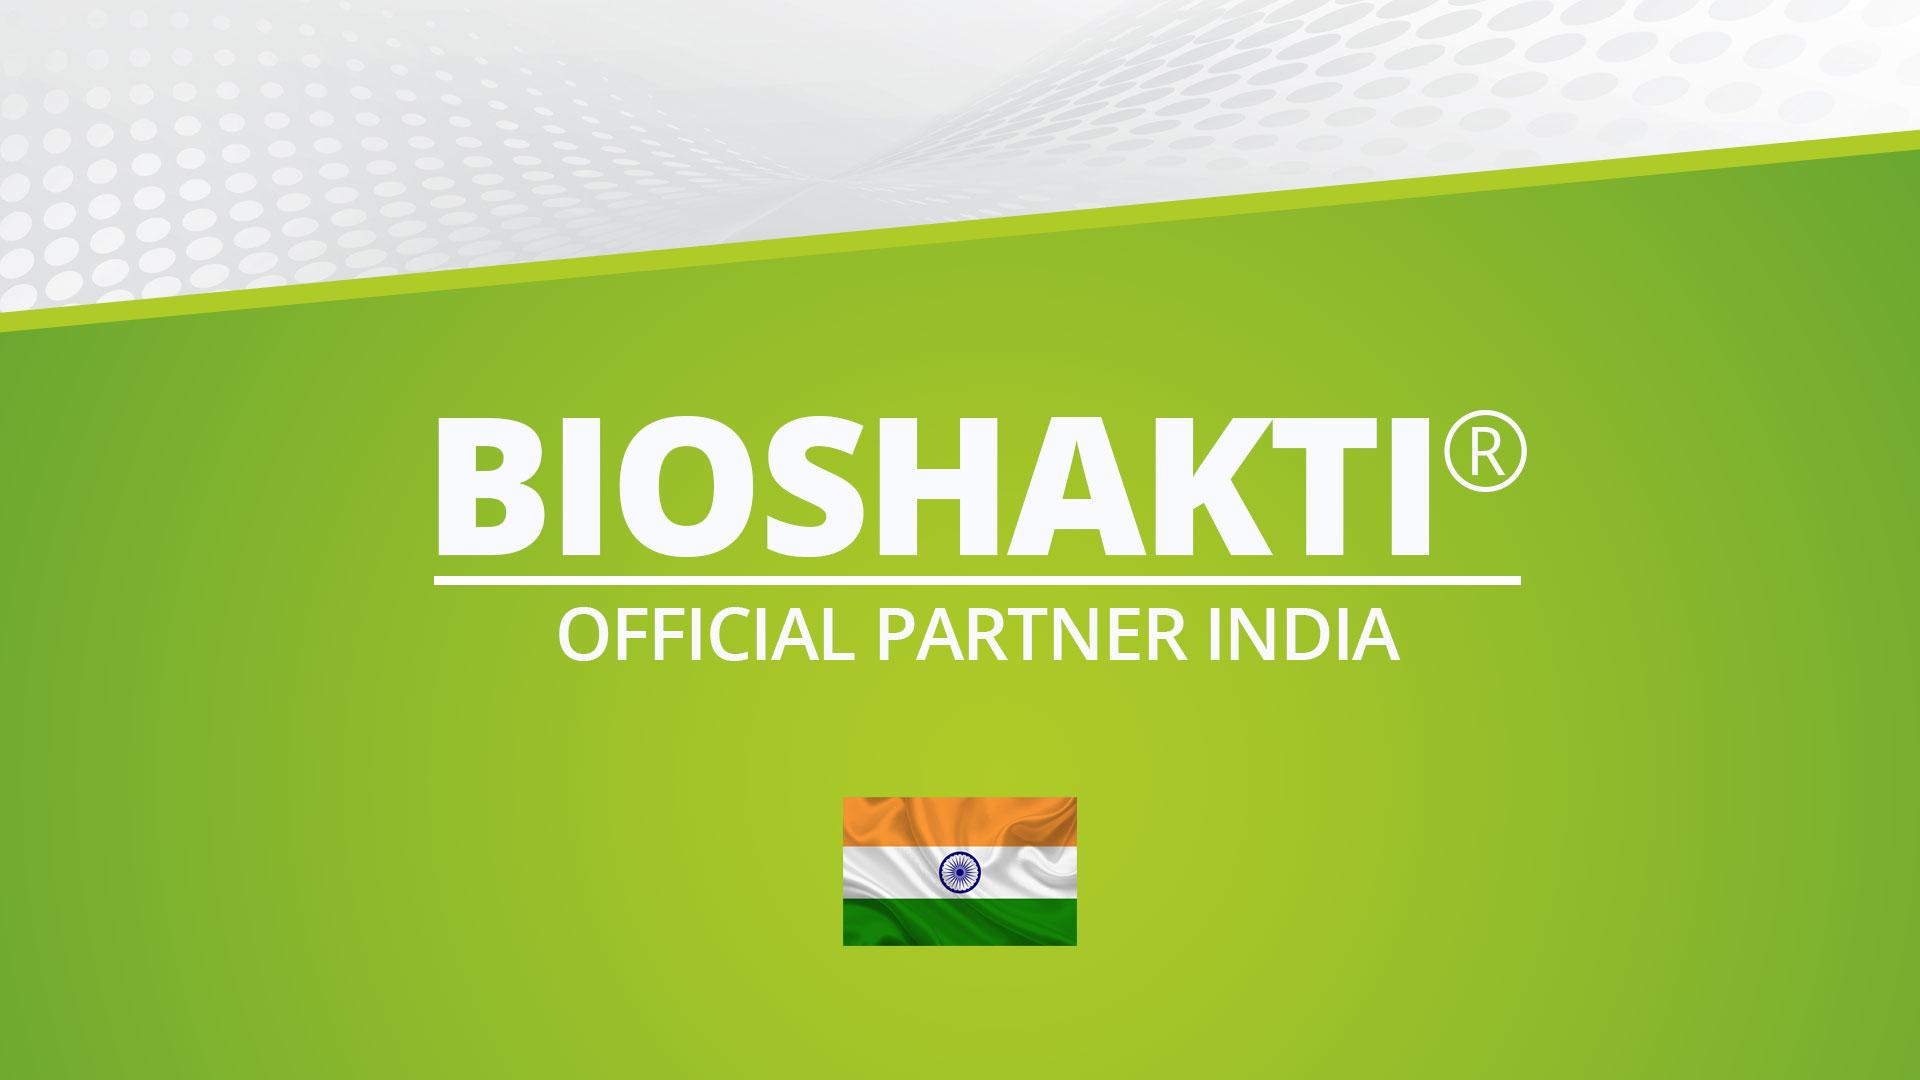 renergon-india-biogas-ad-plant-cng